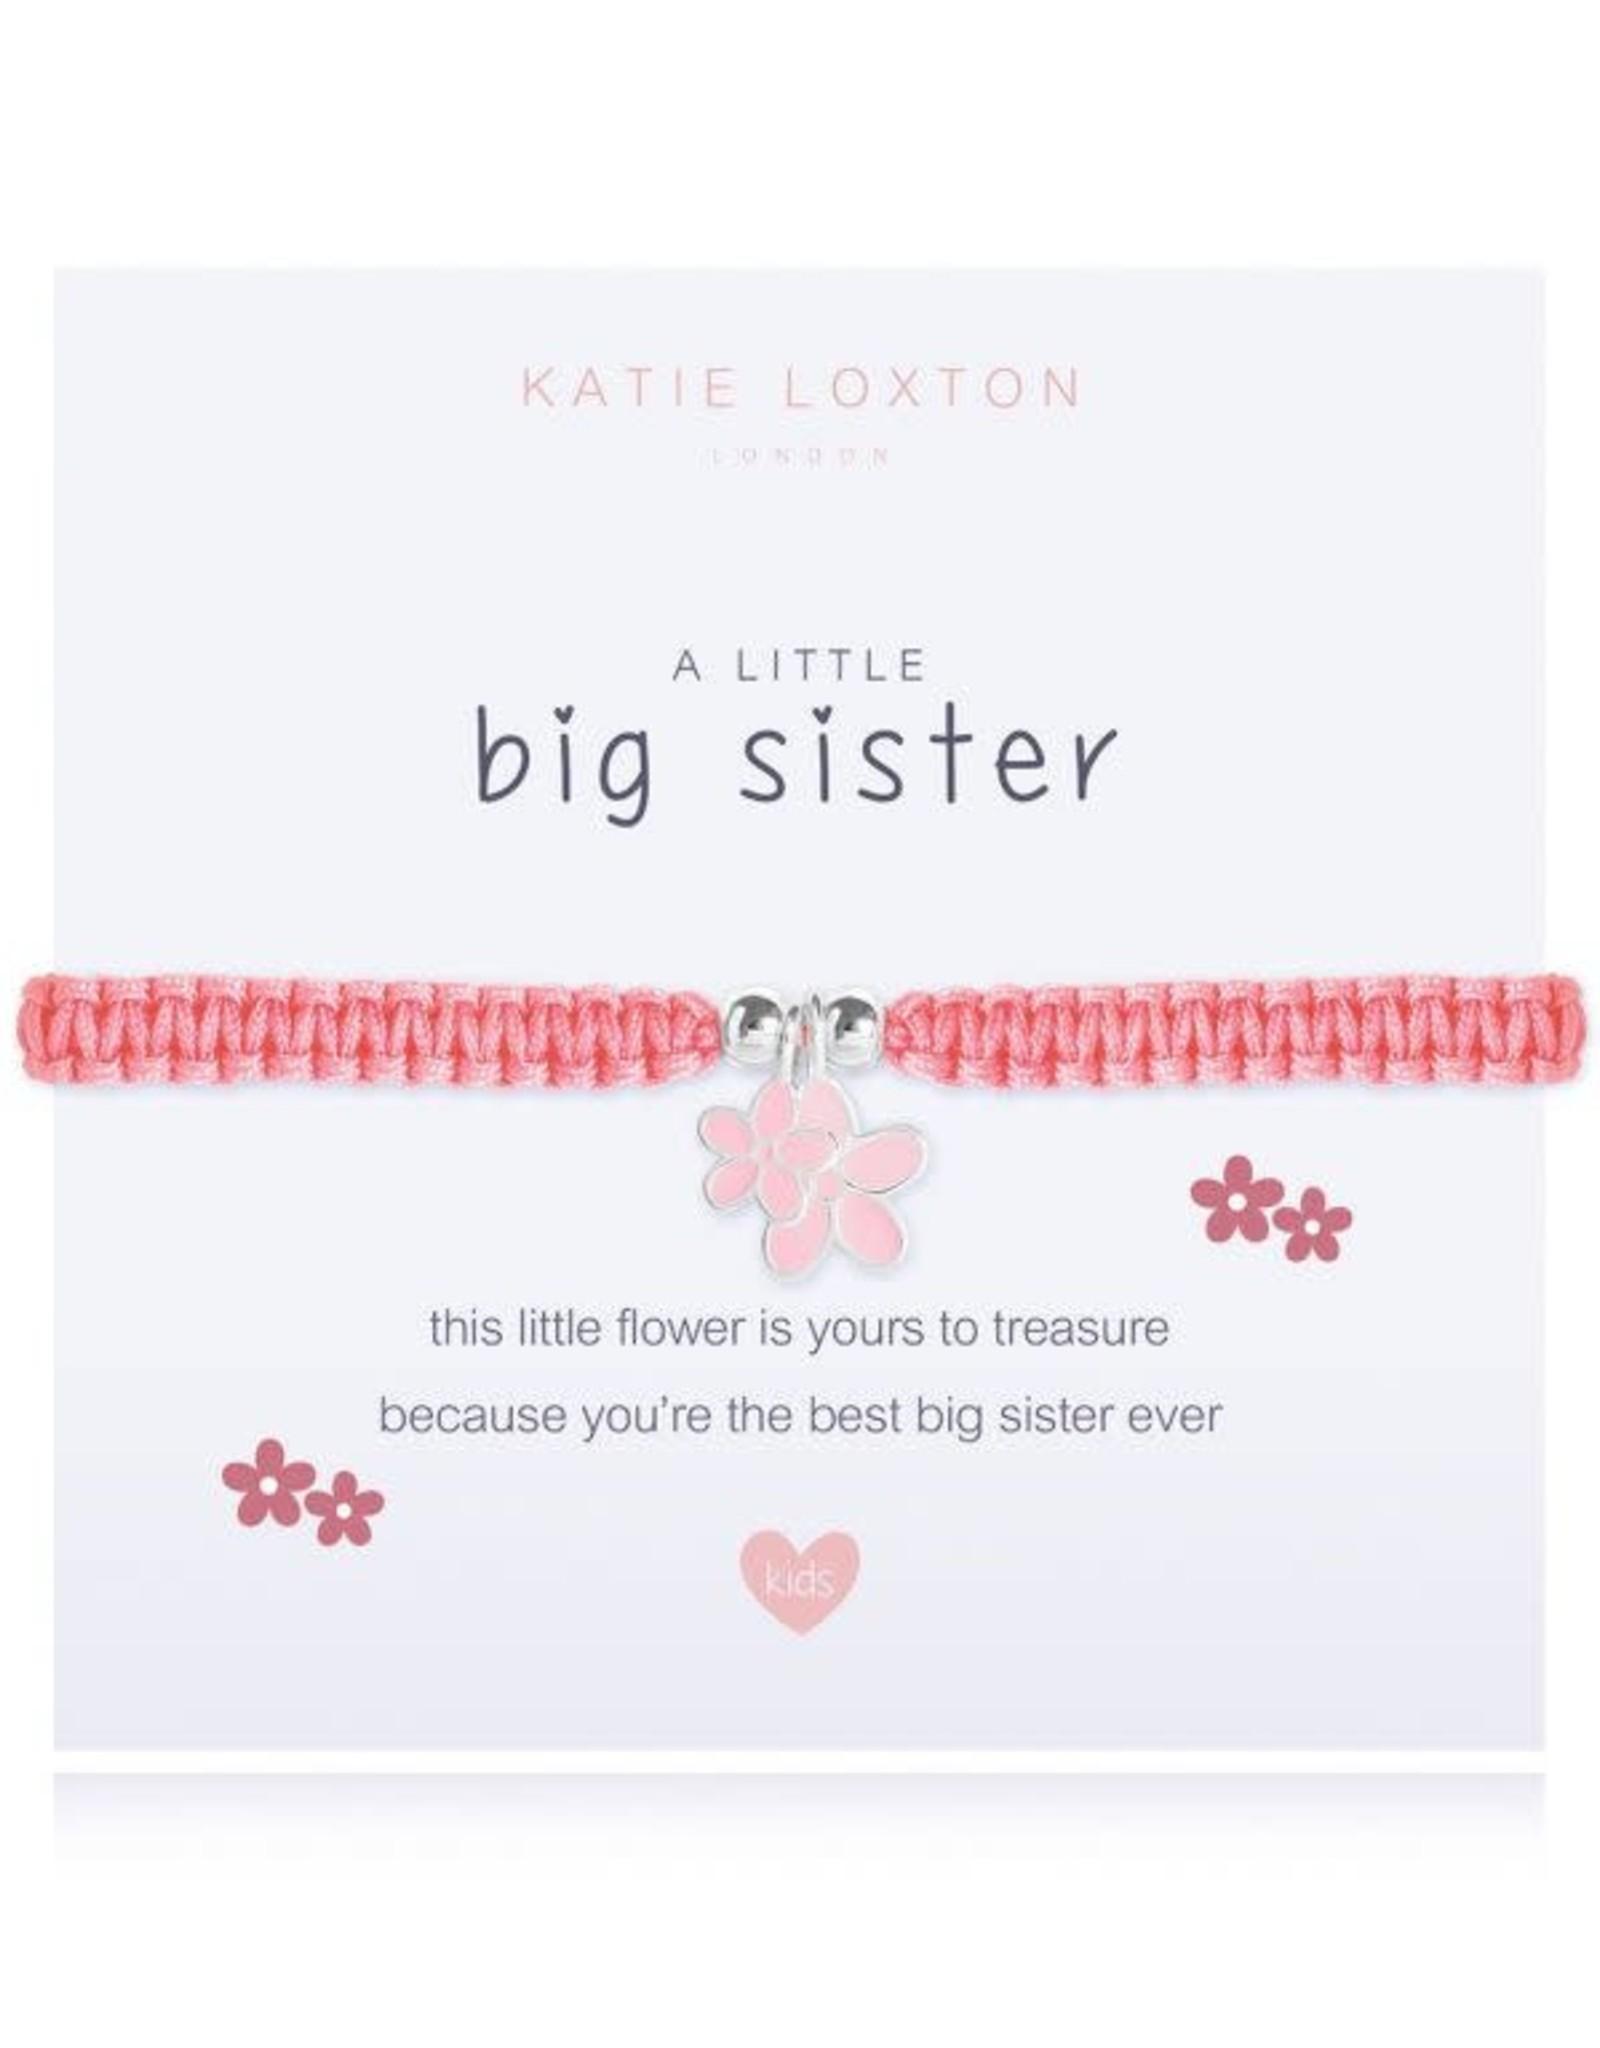 Katie Loxton Child's Friendship Bracelet Big Sister